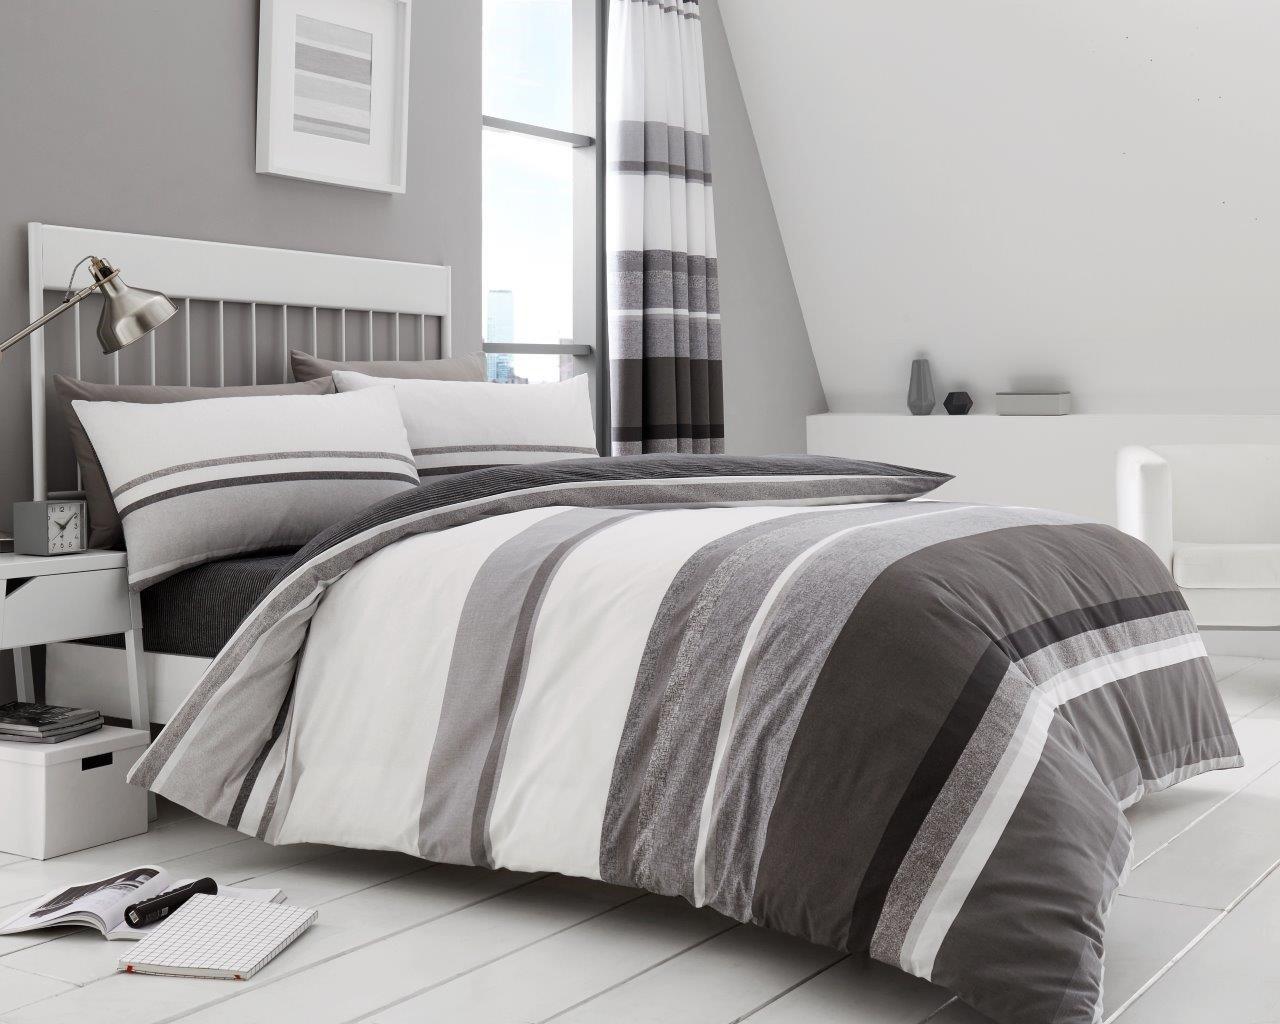 Hudson Duvet Cover Set Quilt or Complete Size Double King Super Single Bedding